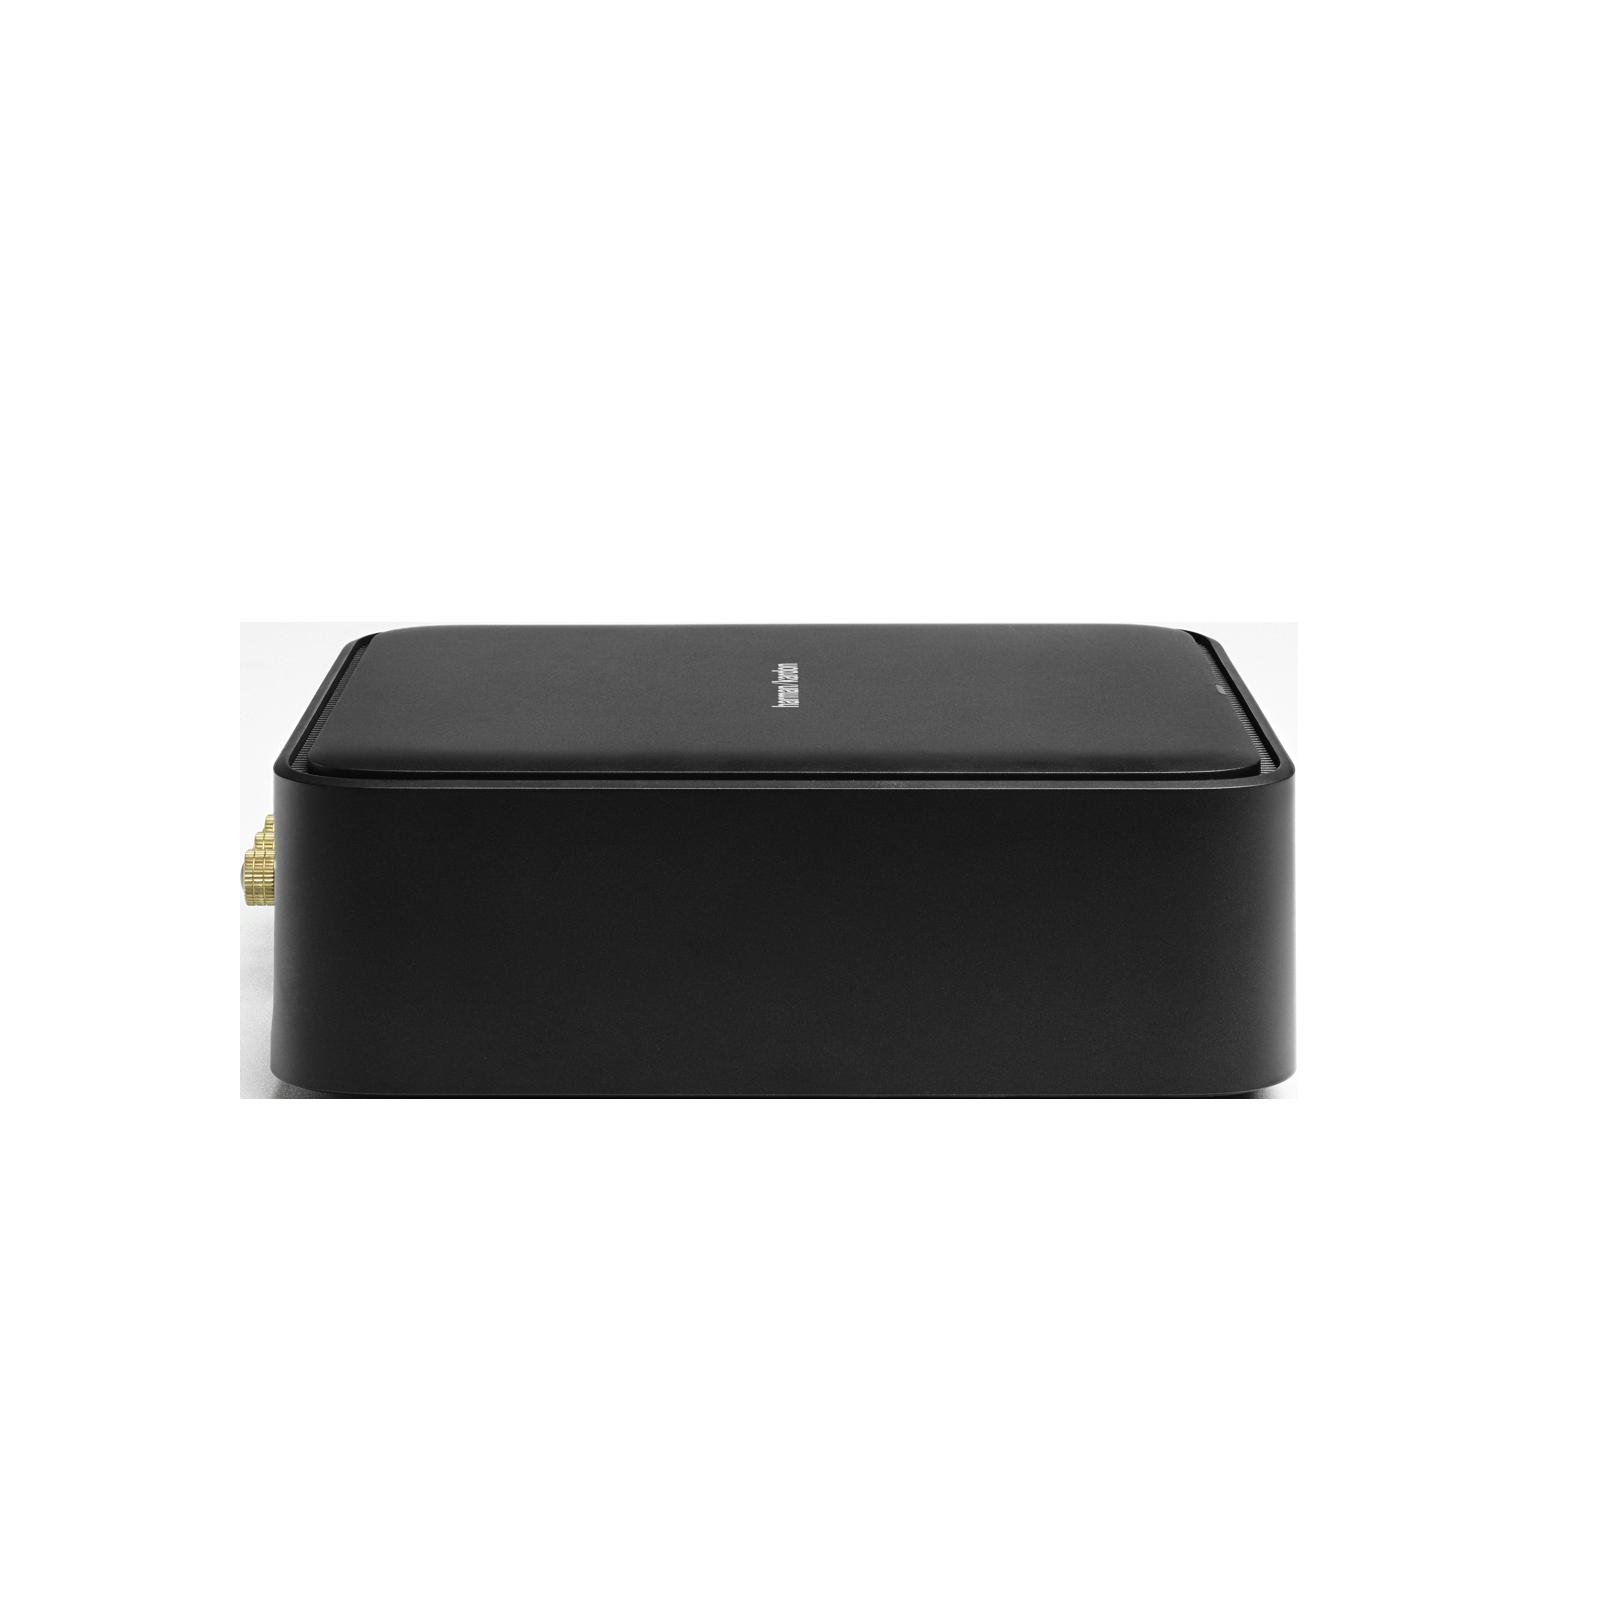 Harman Kardon Citation Amp - Black - High-power, wireless streaming stereo amplifier - Left